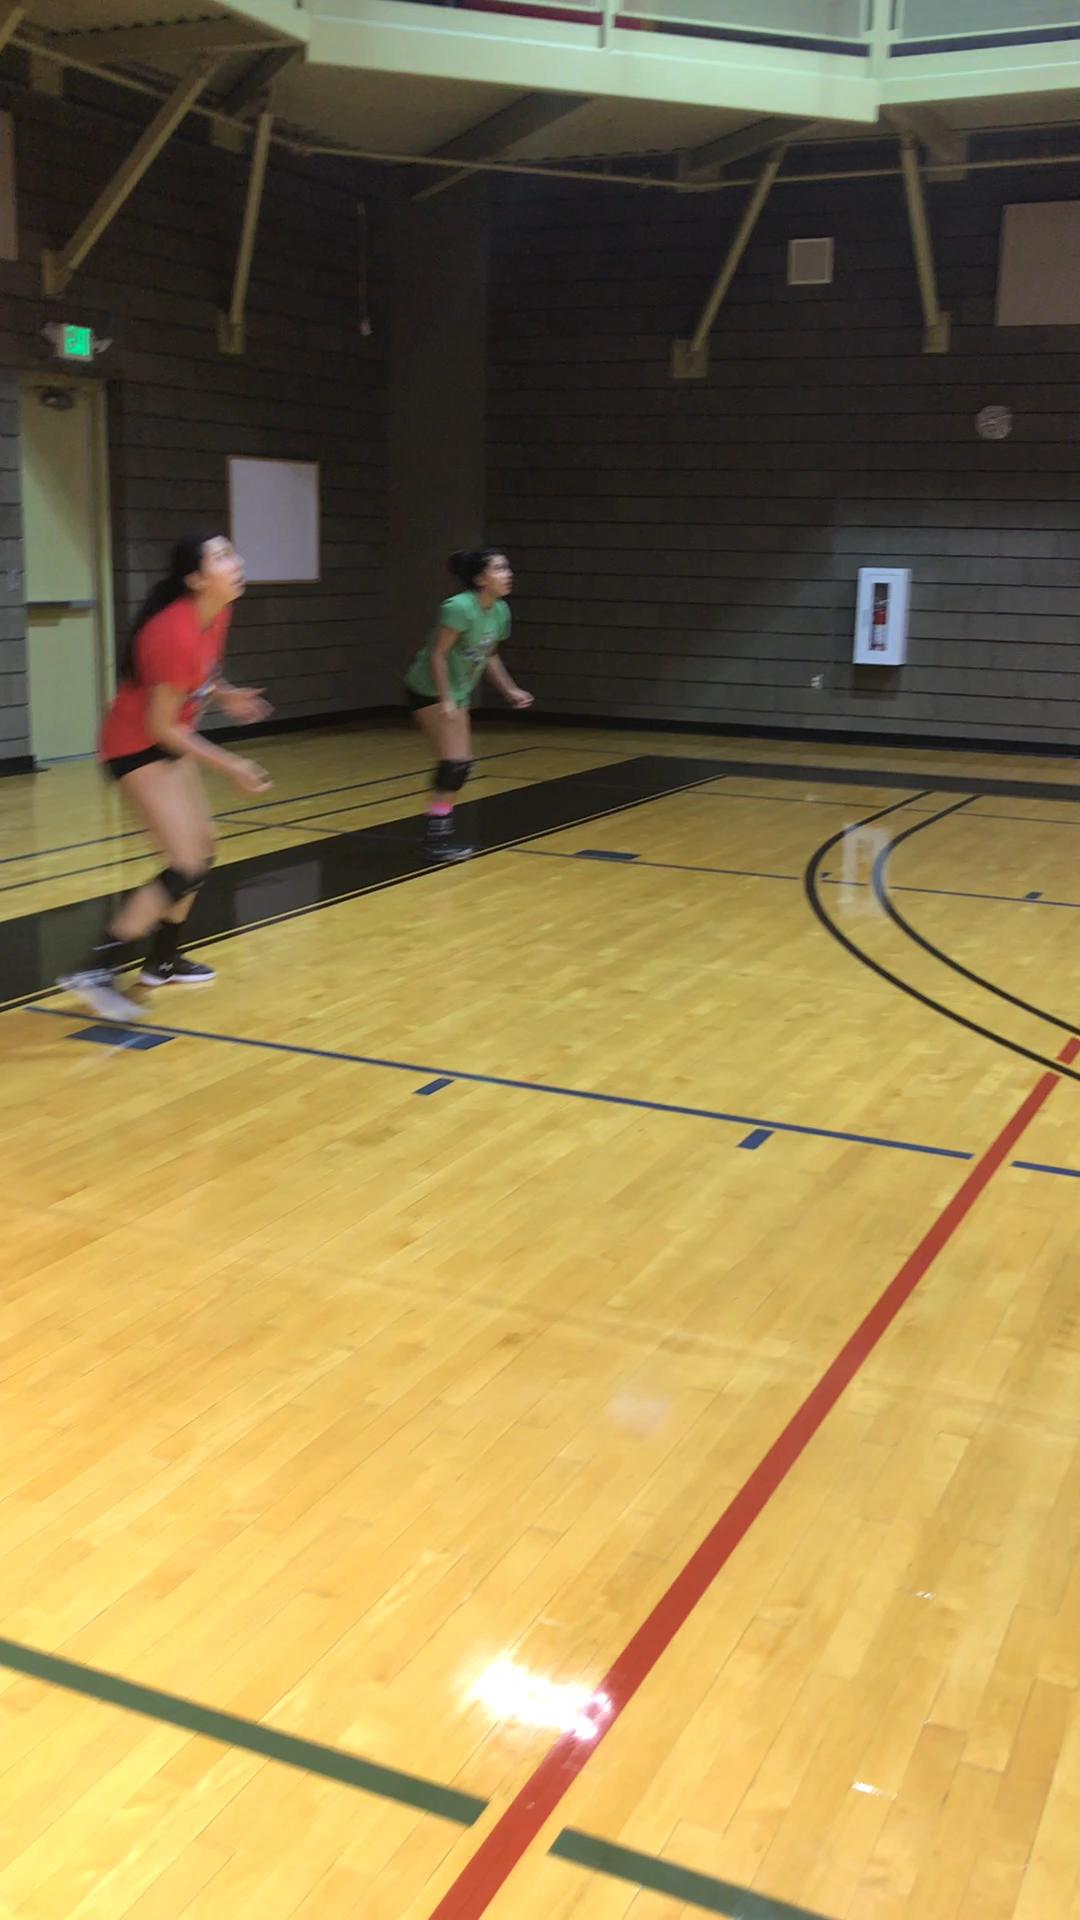 4 Volleyball Passing Drills How To Get Better At Passing In Volleyball Video Video Voleibol Treino De Voleibol Volei